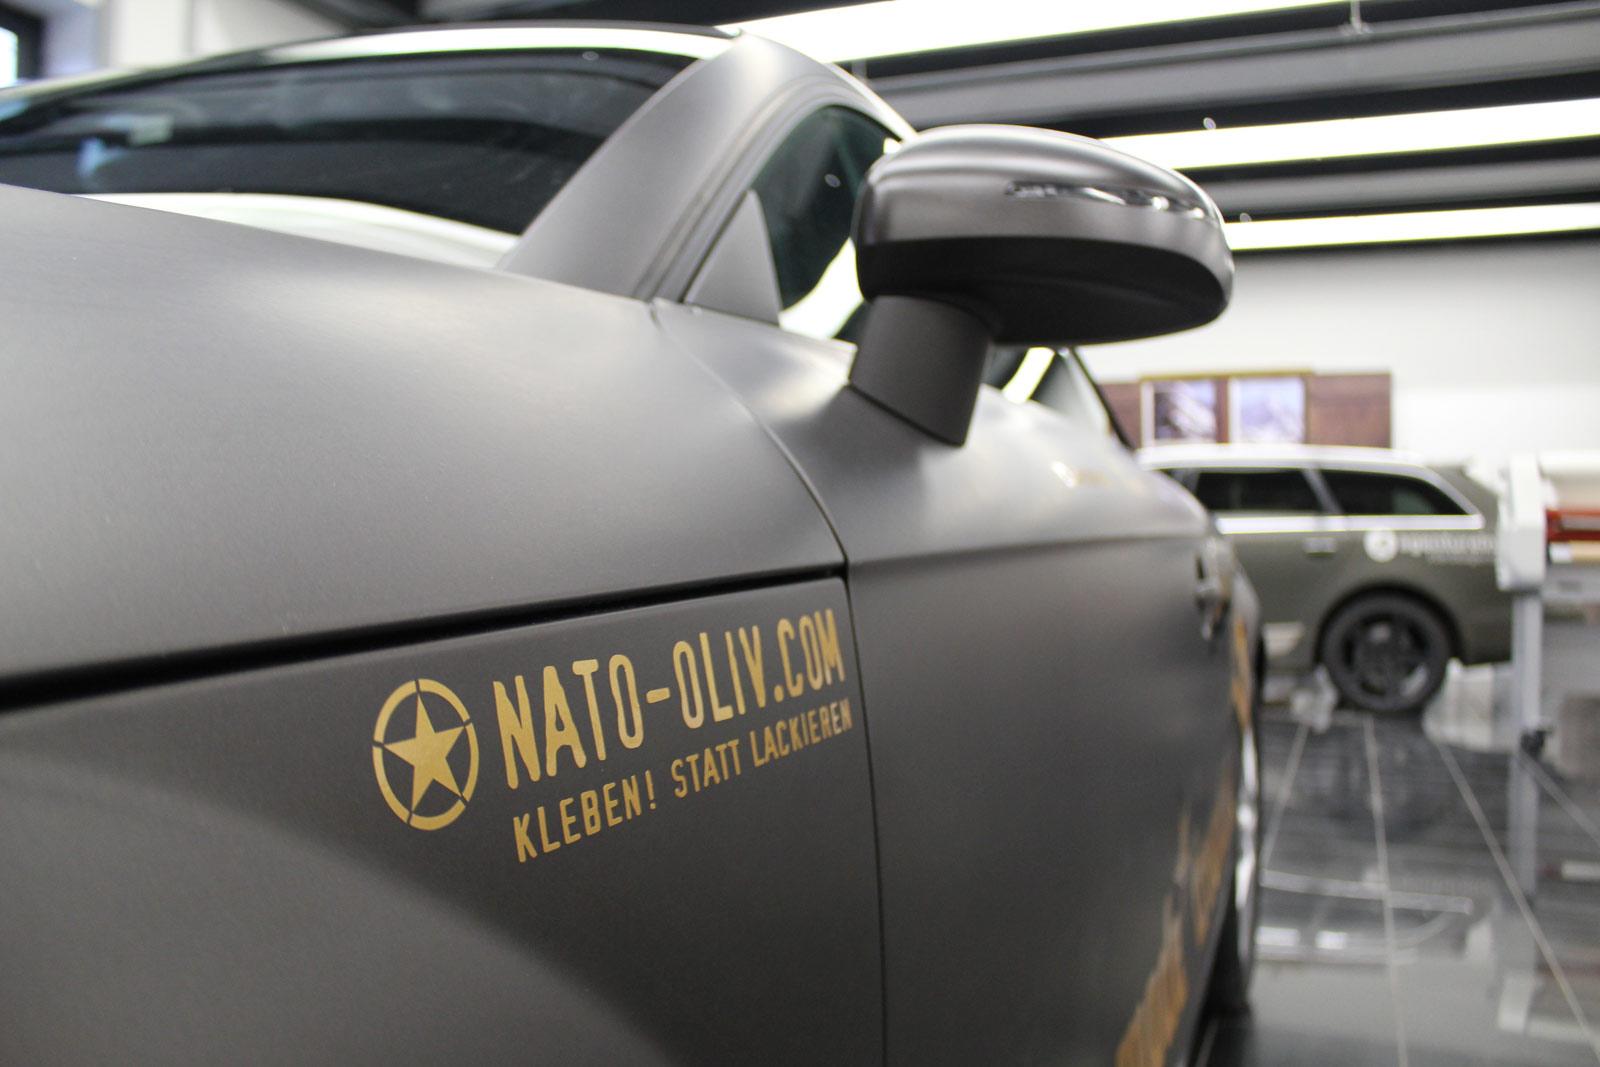 Audi_TT_Braun_Matt_Metallic_Branding_25